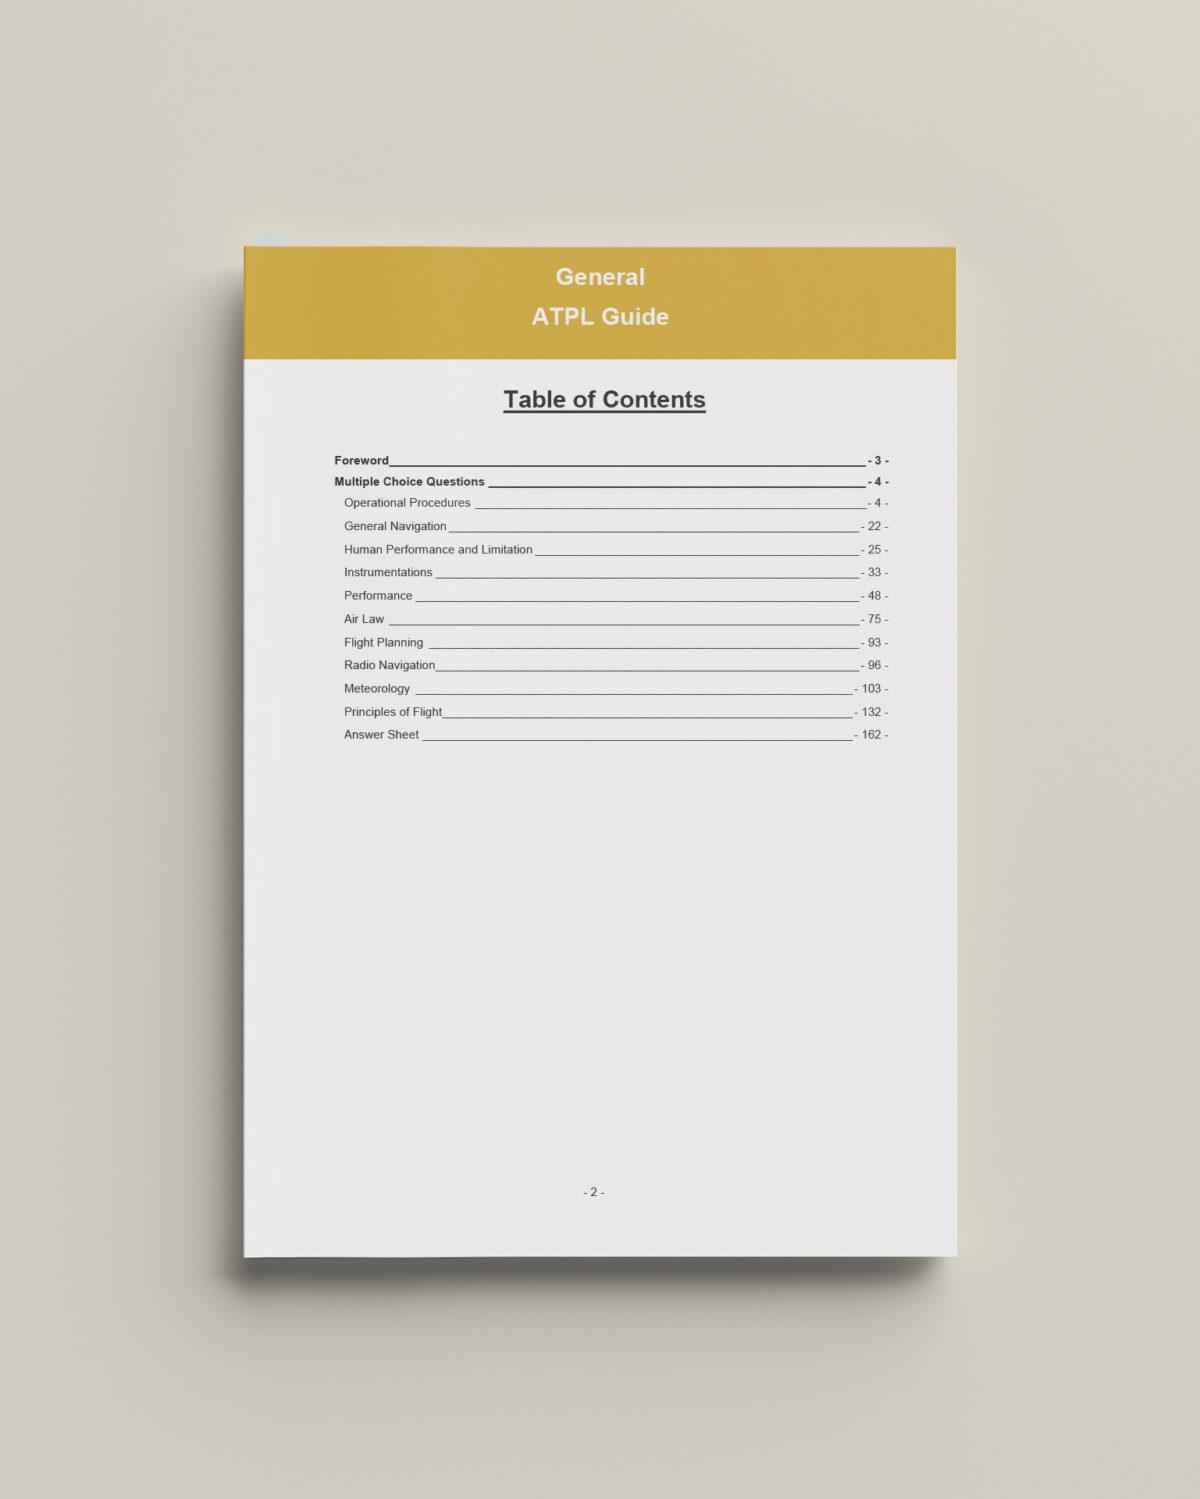 AirlineAssessment General ATPL Guide Teaser 1